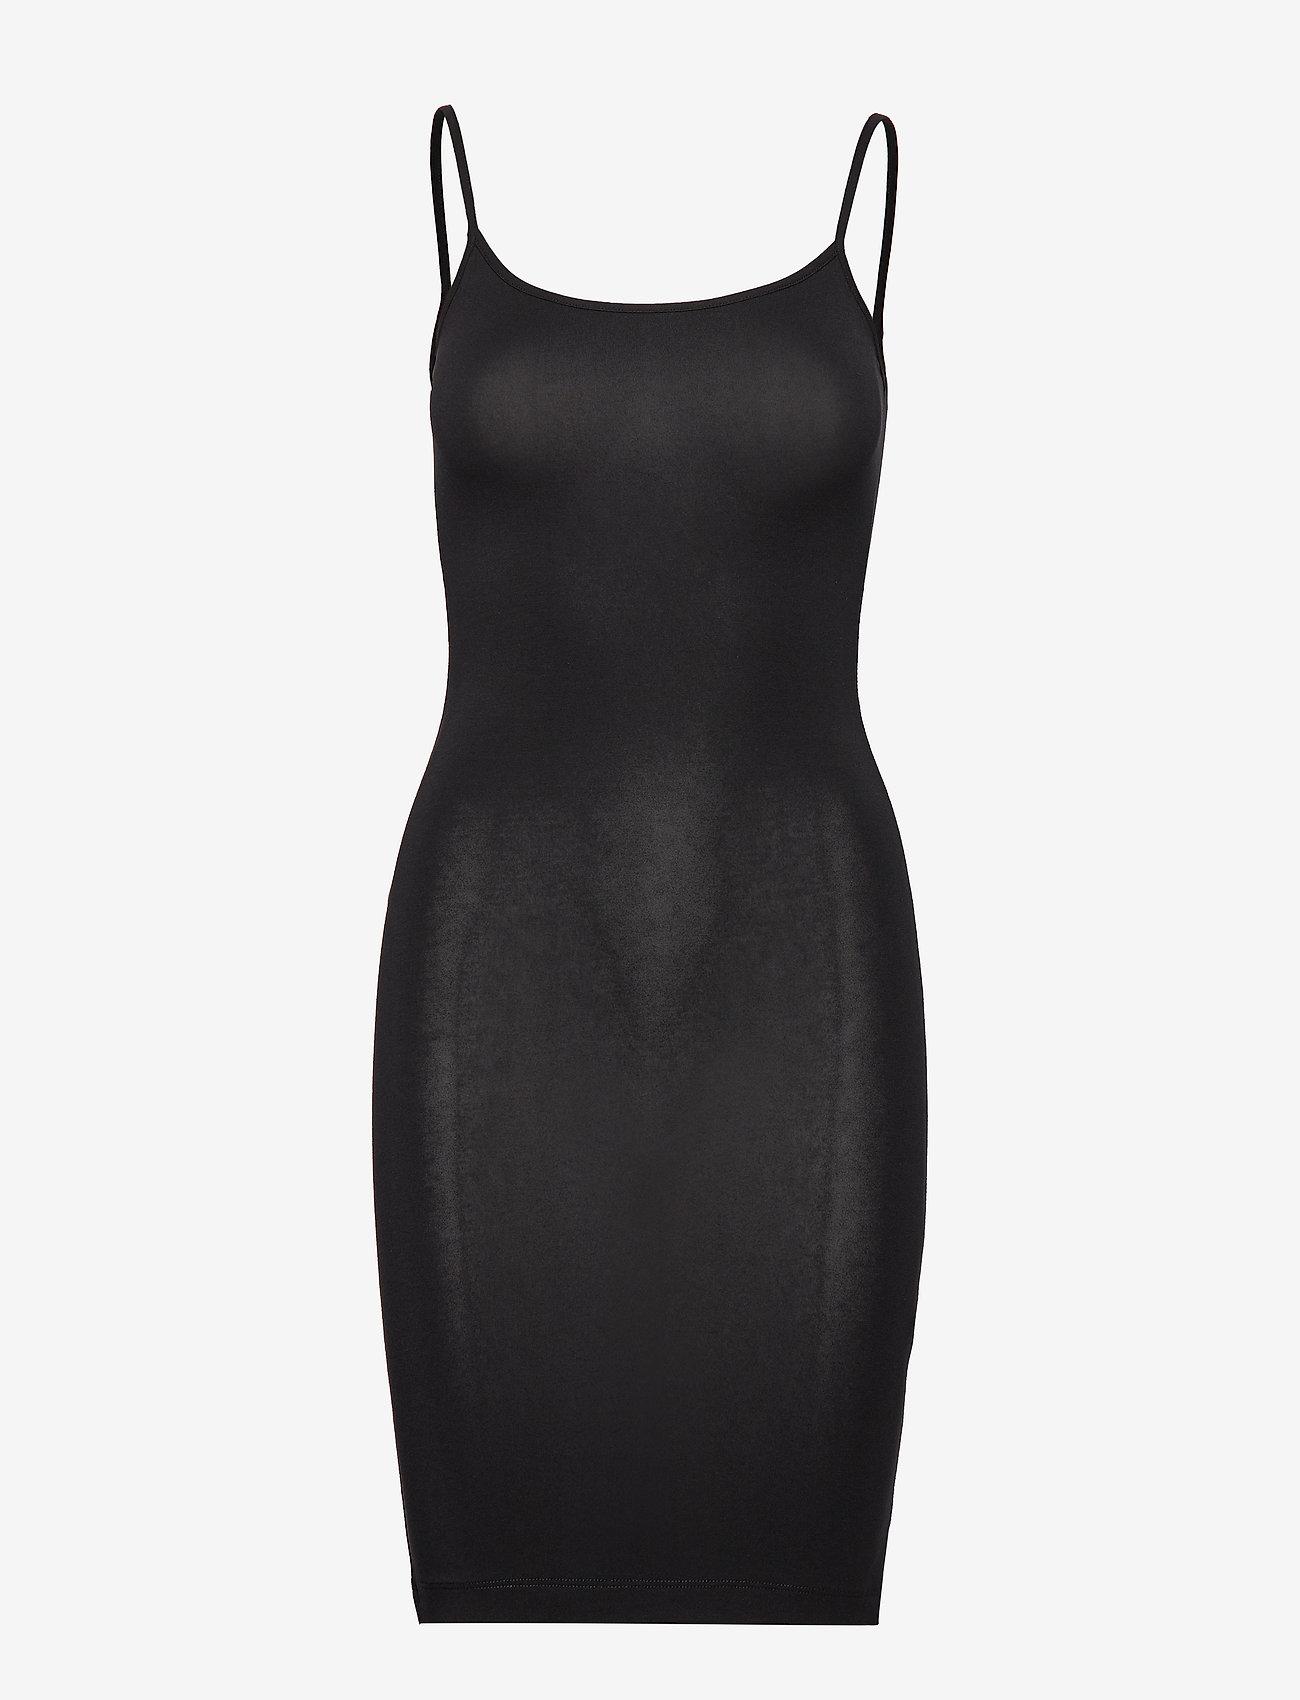 Samsøe Samsøe - Talla slip dress 265 - bodies & slips - black - 1